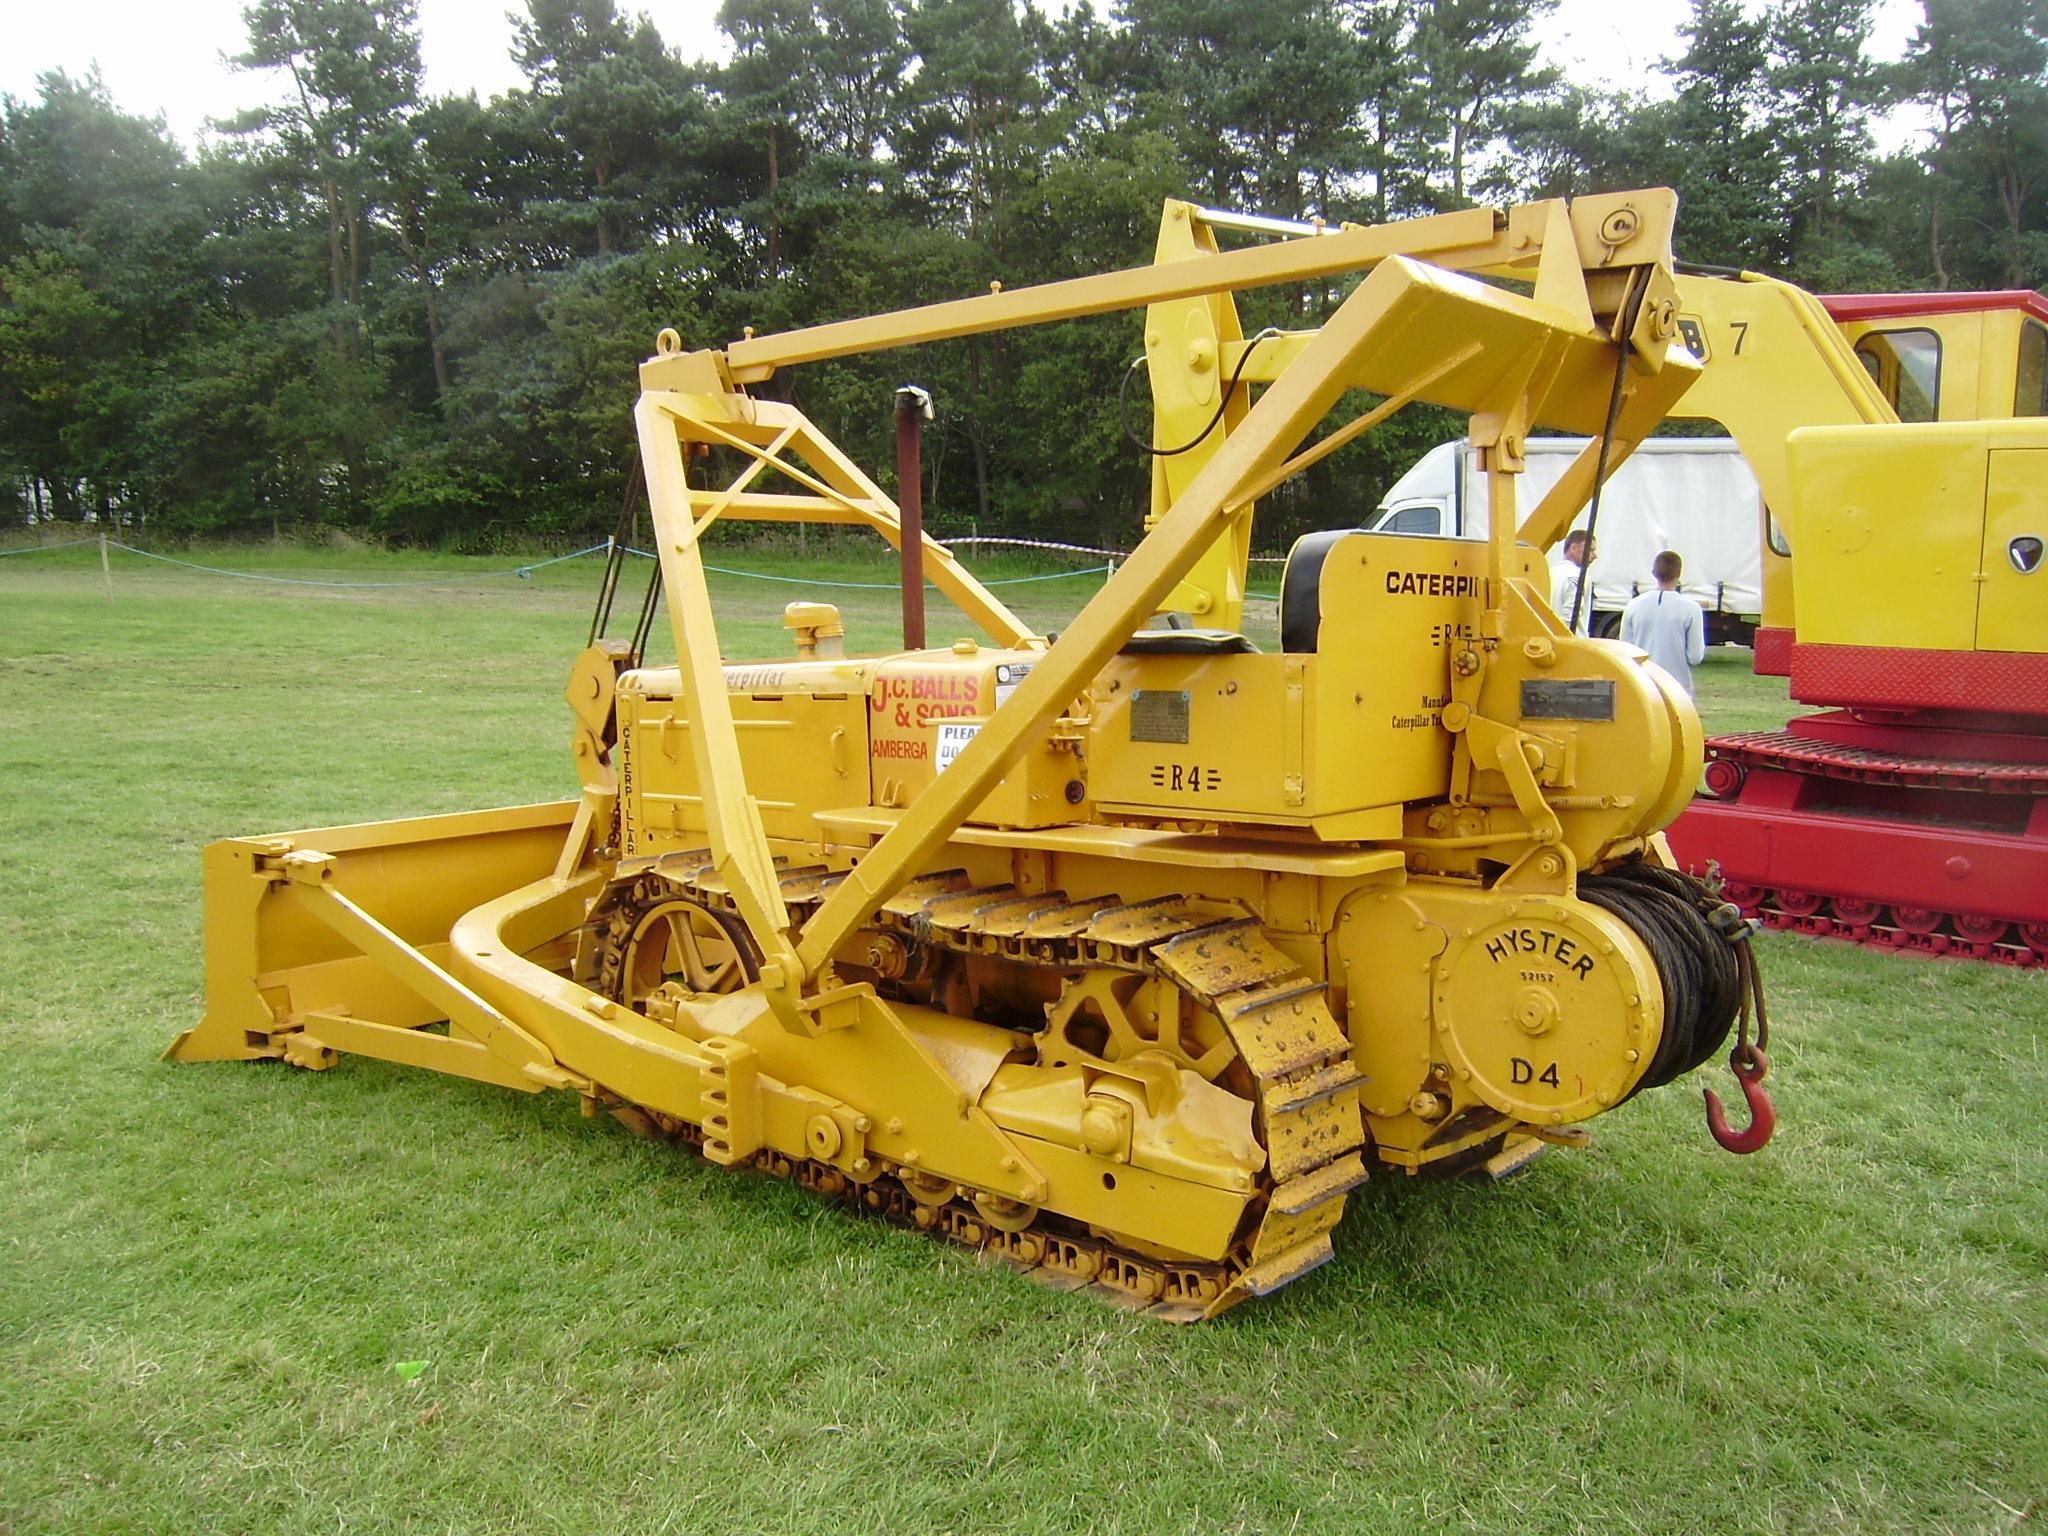 Lawn Tractor Dozer Tracks Conversion : Caterpillar inc tractor construction plant wiki the